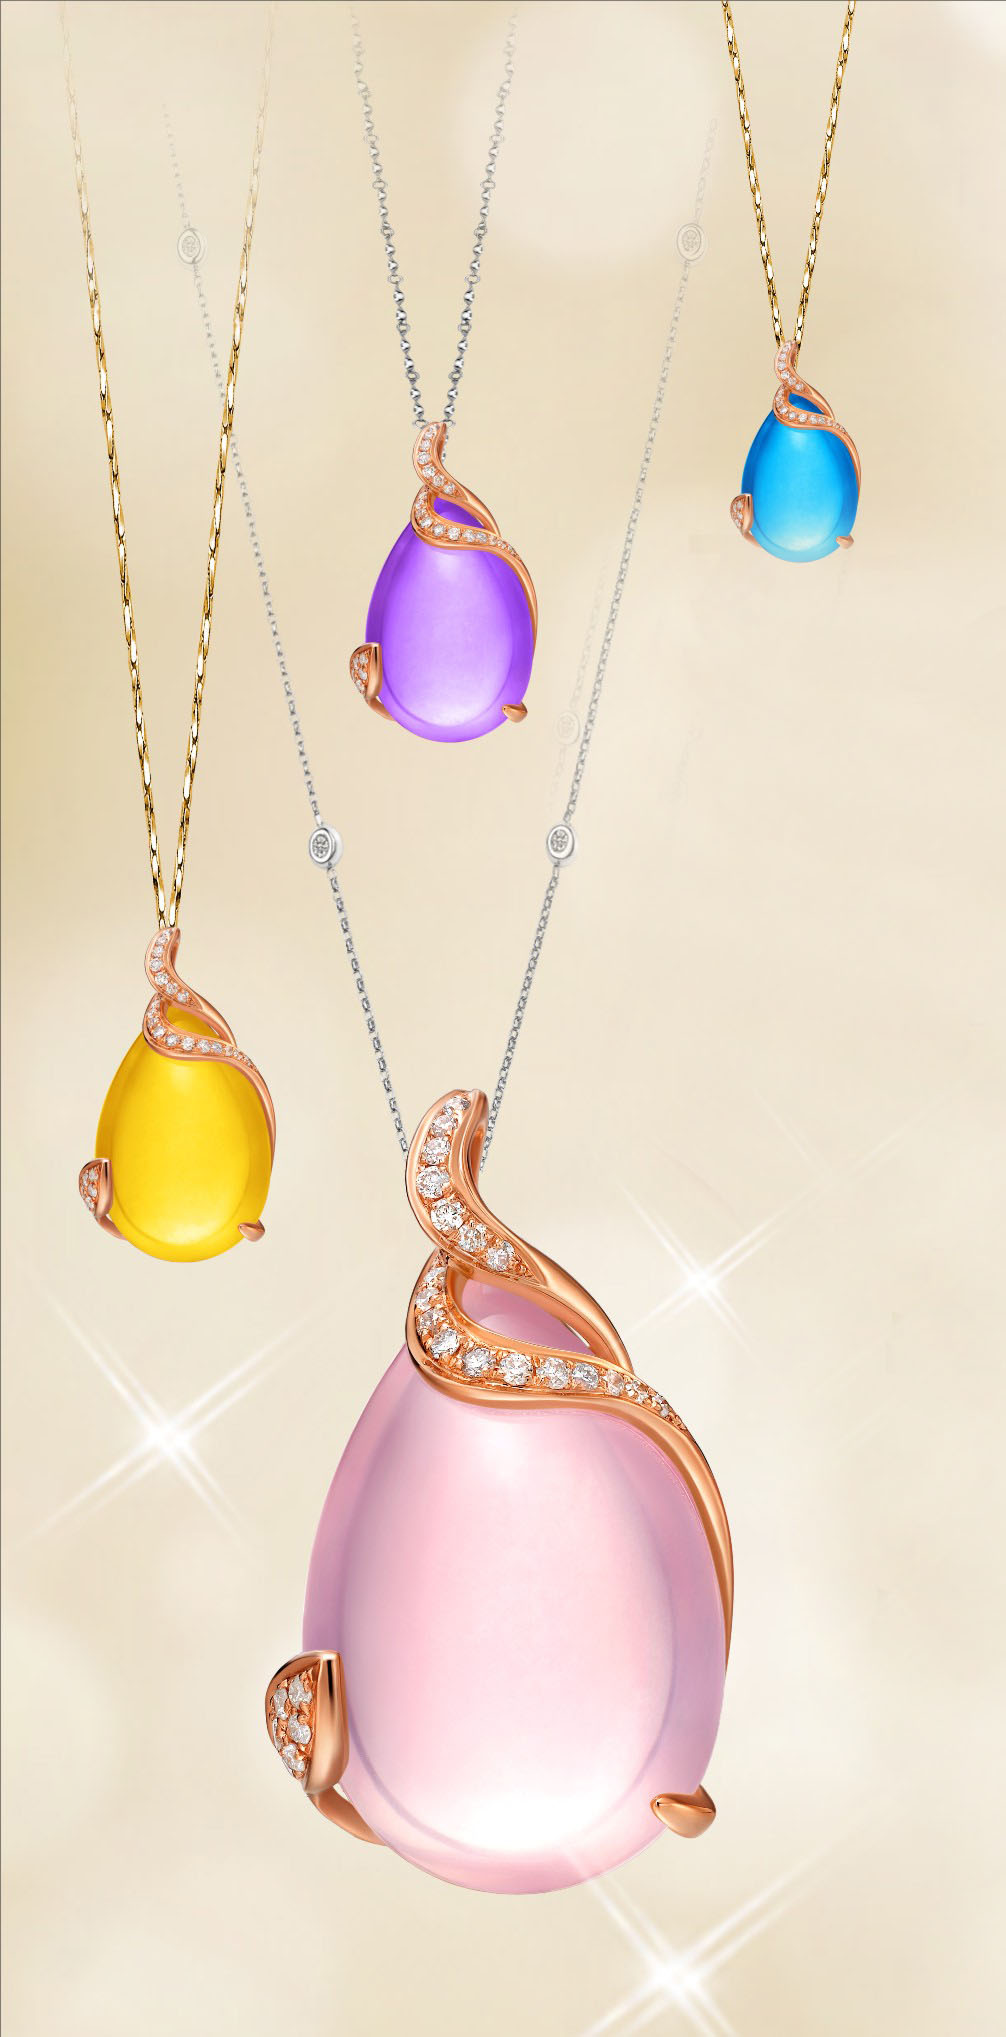 COLORBAY格莱贝携彩宝珍品闪耀亮相2013中国国际珠宝展